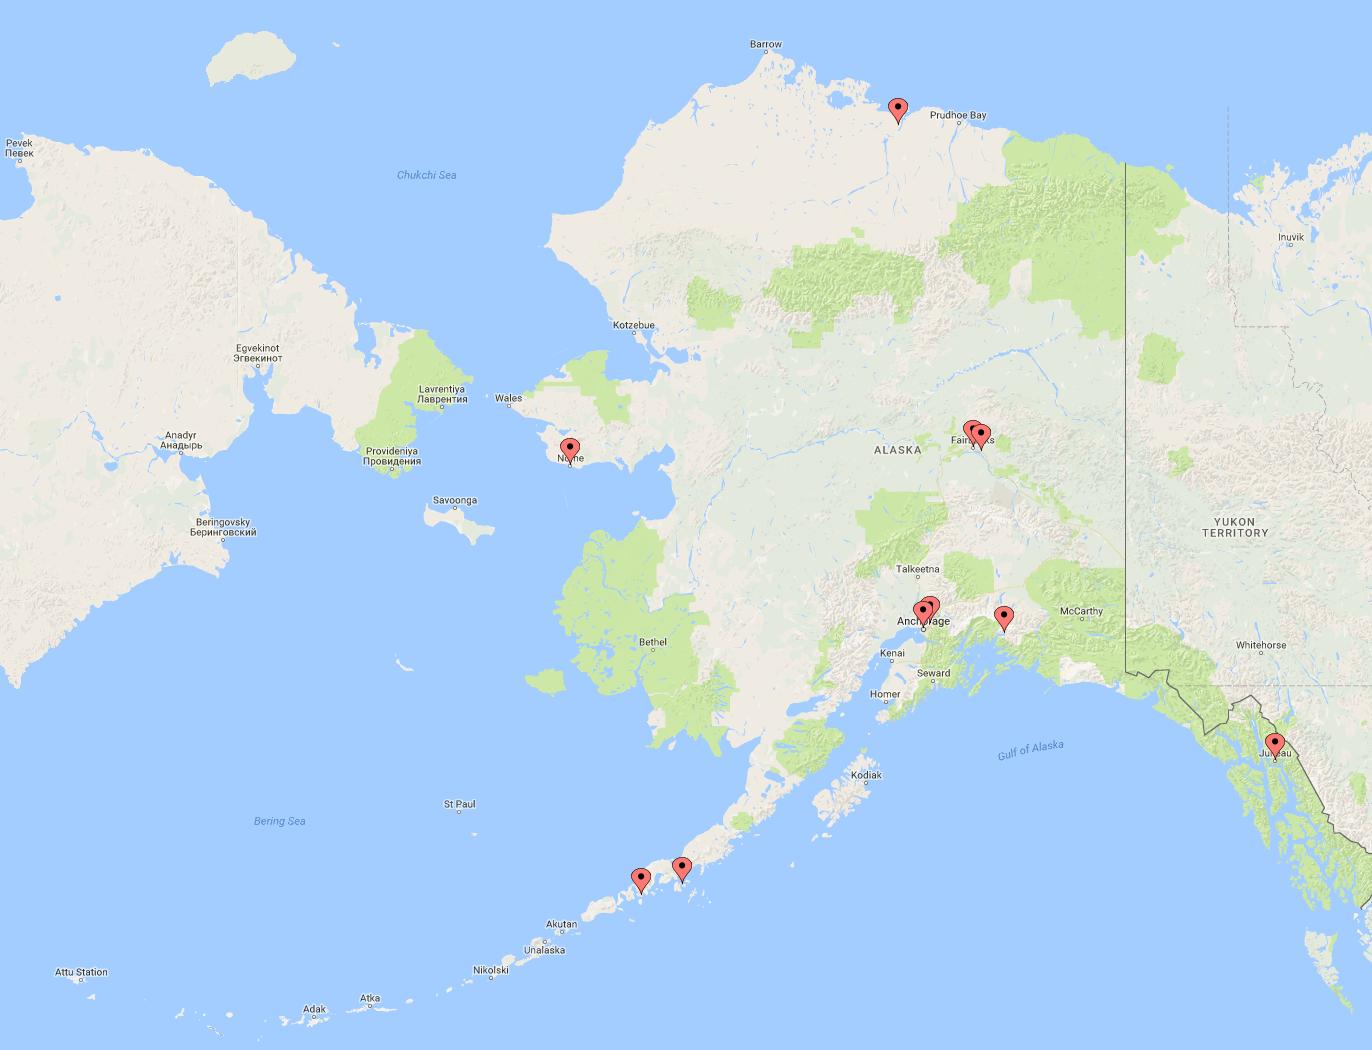 2015-16studentlocations